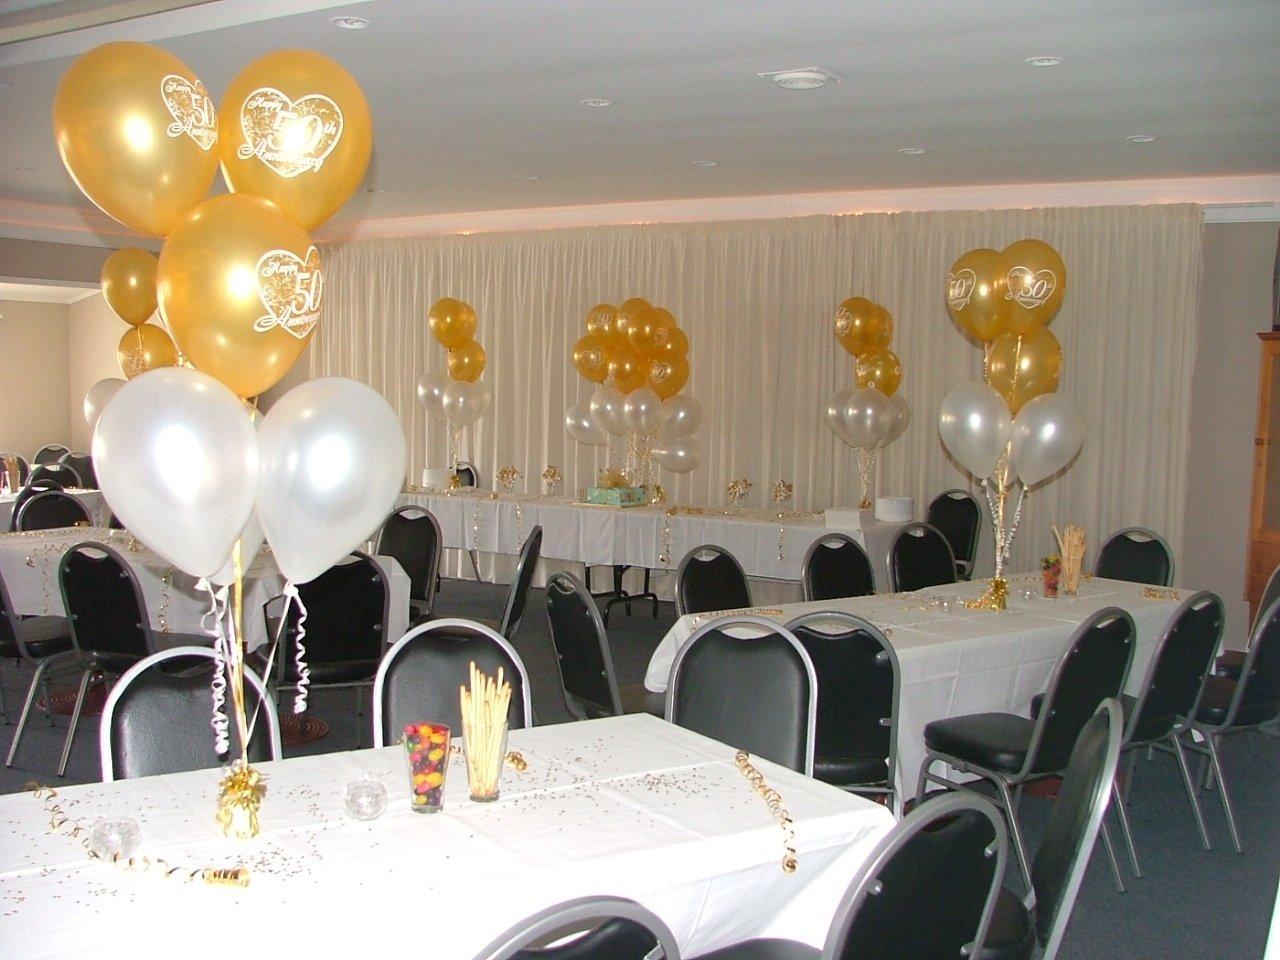 50th wedding anniversary decorating ideas - wedding decorations